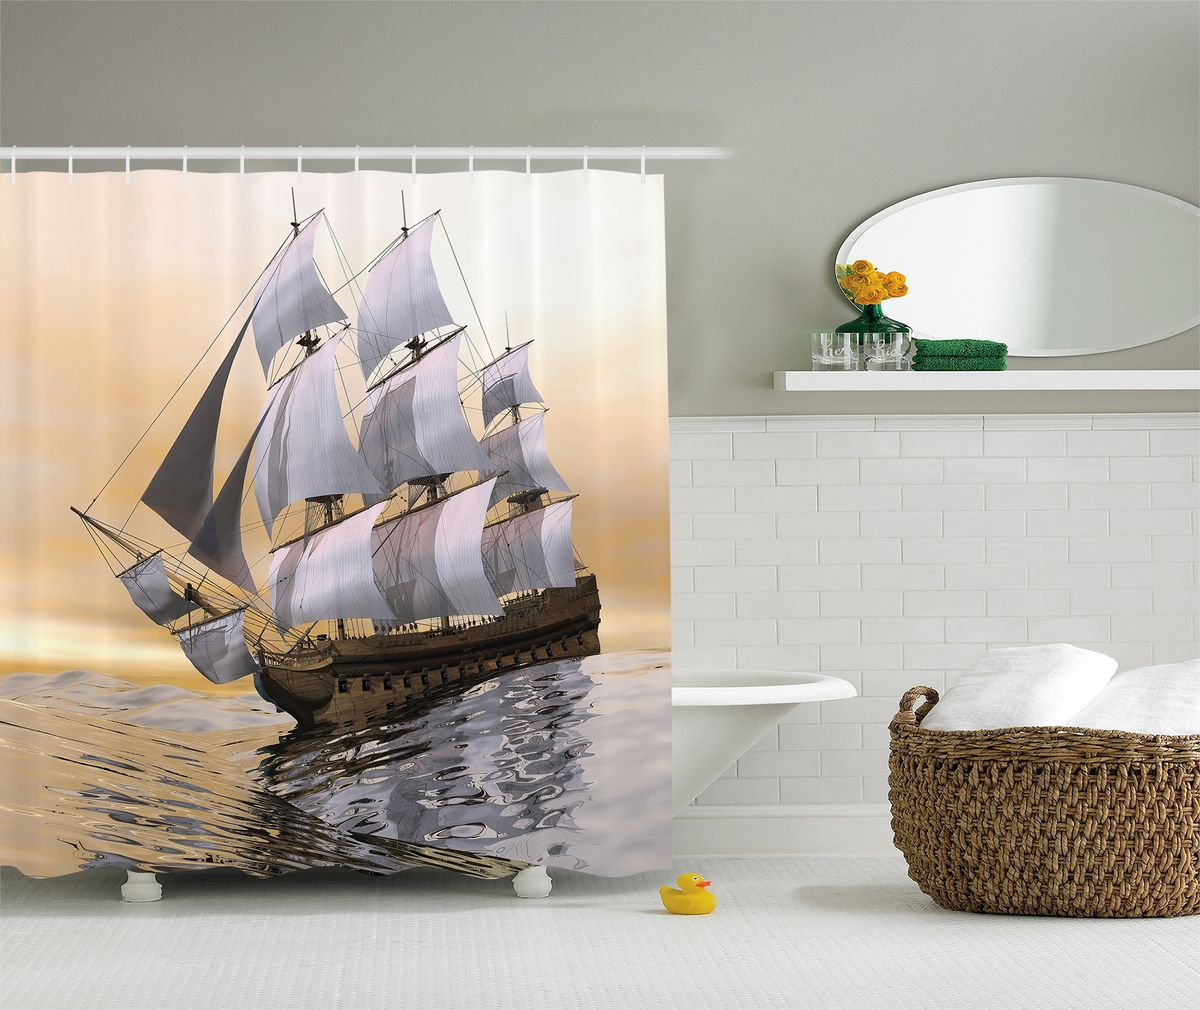 Штора для ванной комнаты Magic Lady Корабль на закате, цвет: бежевый, серый, коричневый, 180 х 200 см цена